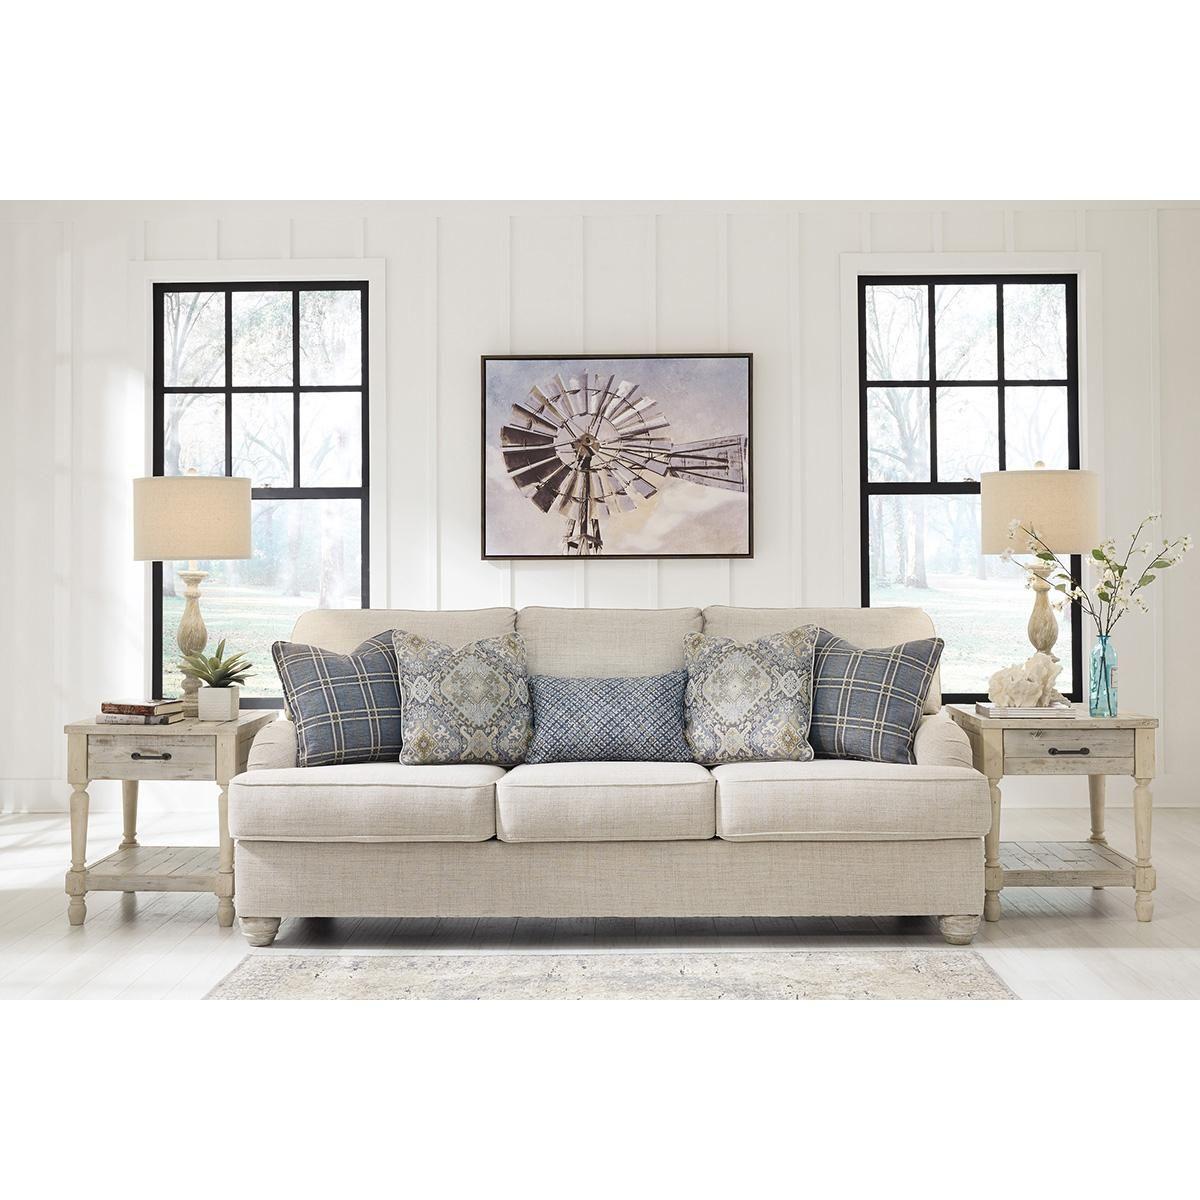 Signature Design By Ashley Traemore Sofa In Linen Nfm Ashley Furniture Furniture Ashley Furniture Sofas